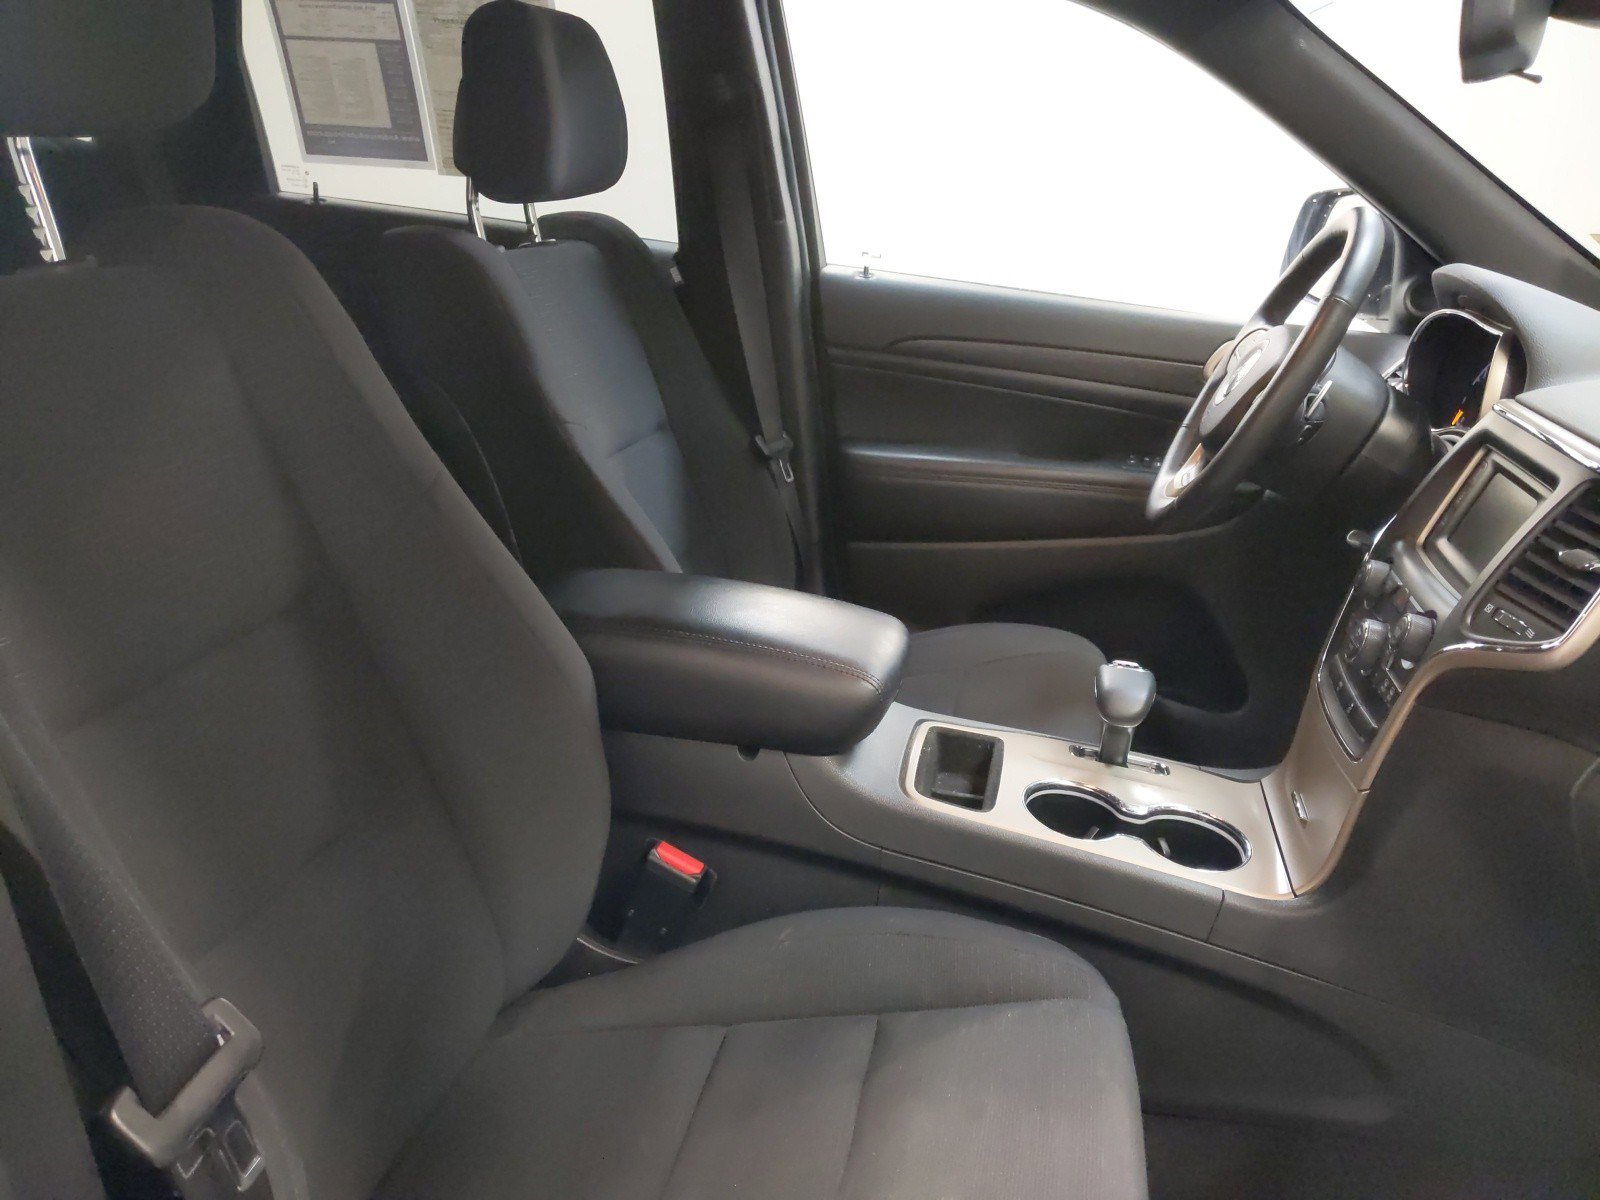 Used 2015 Jeep Grand Cherokee Laredo Sport Utility for sale in Grand Island NE